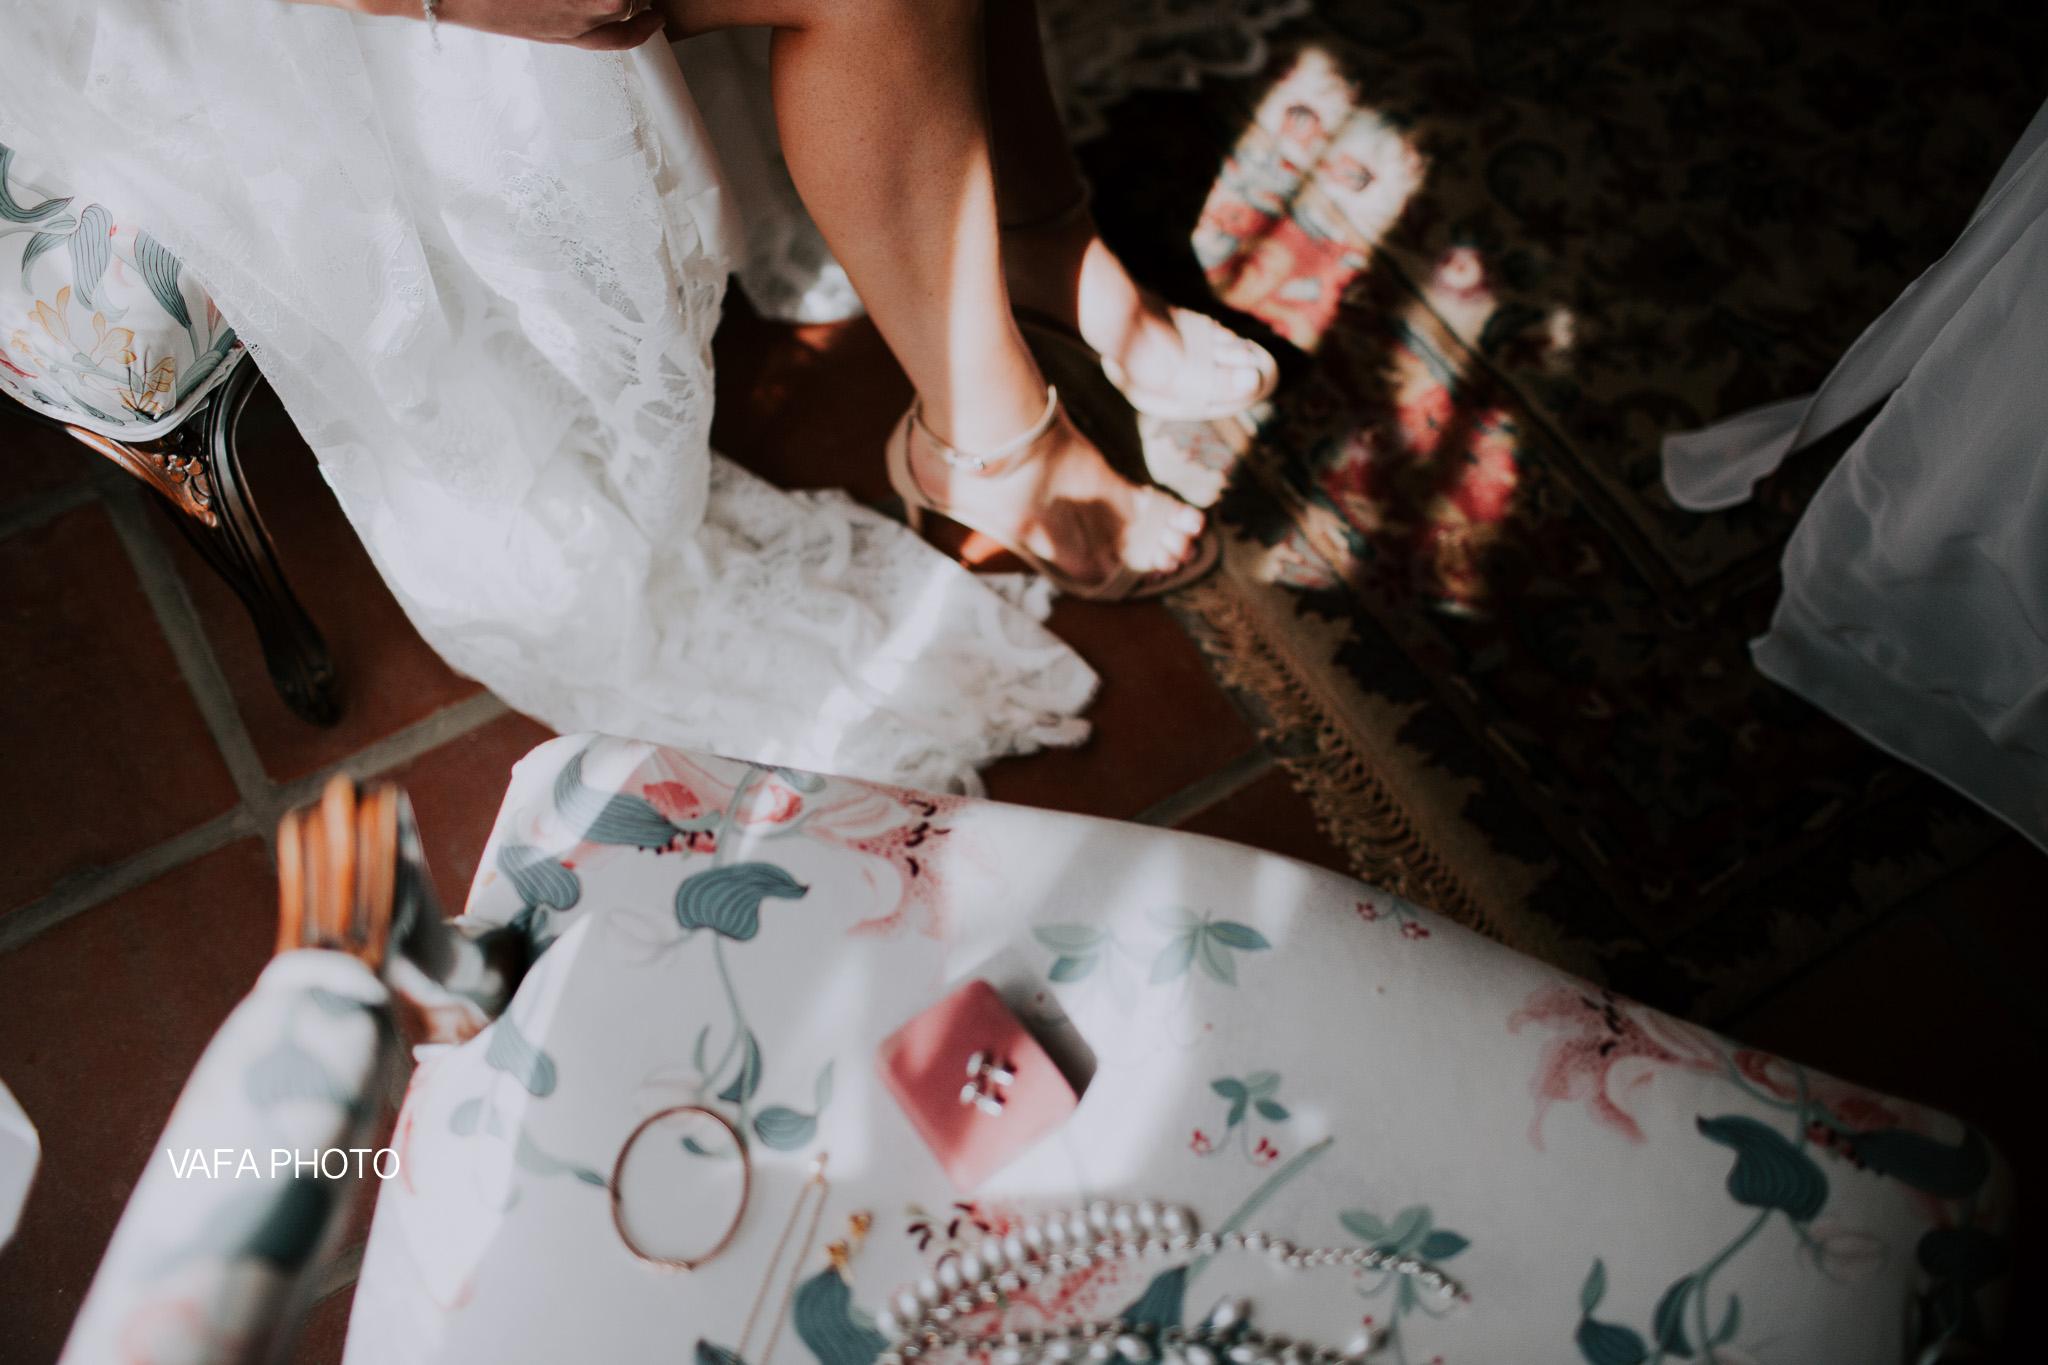 Leo-Carrillo-Ranch-Wedding-Lauren-Mike-Vafa-Photo-151.jpg